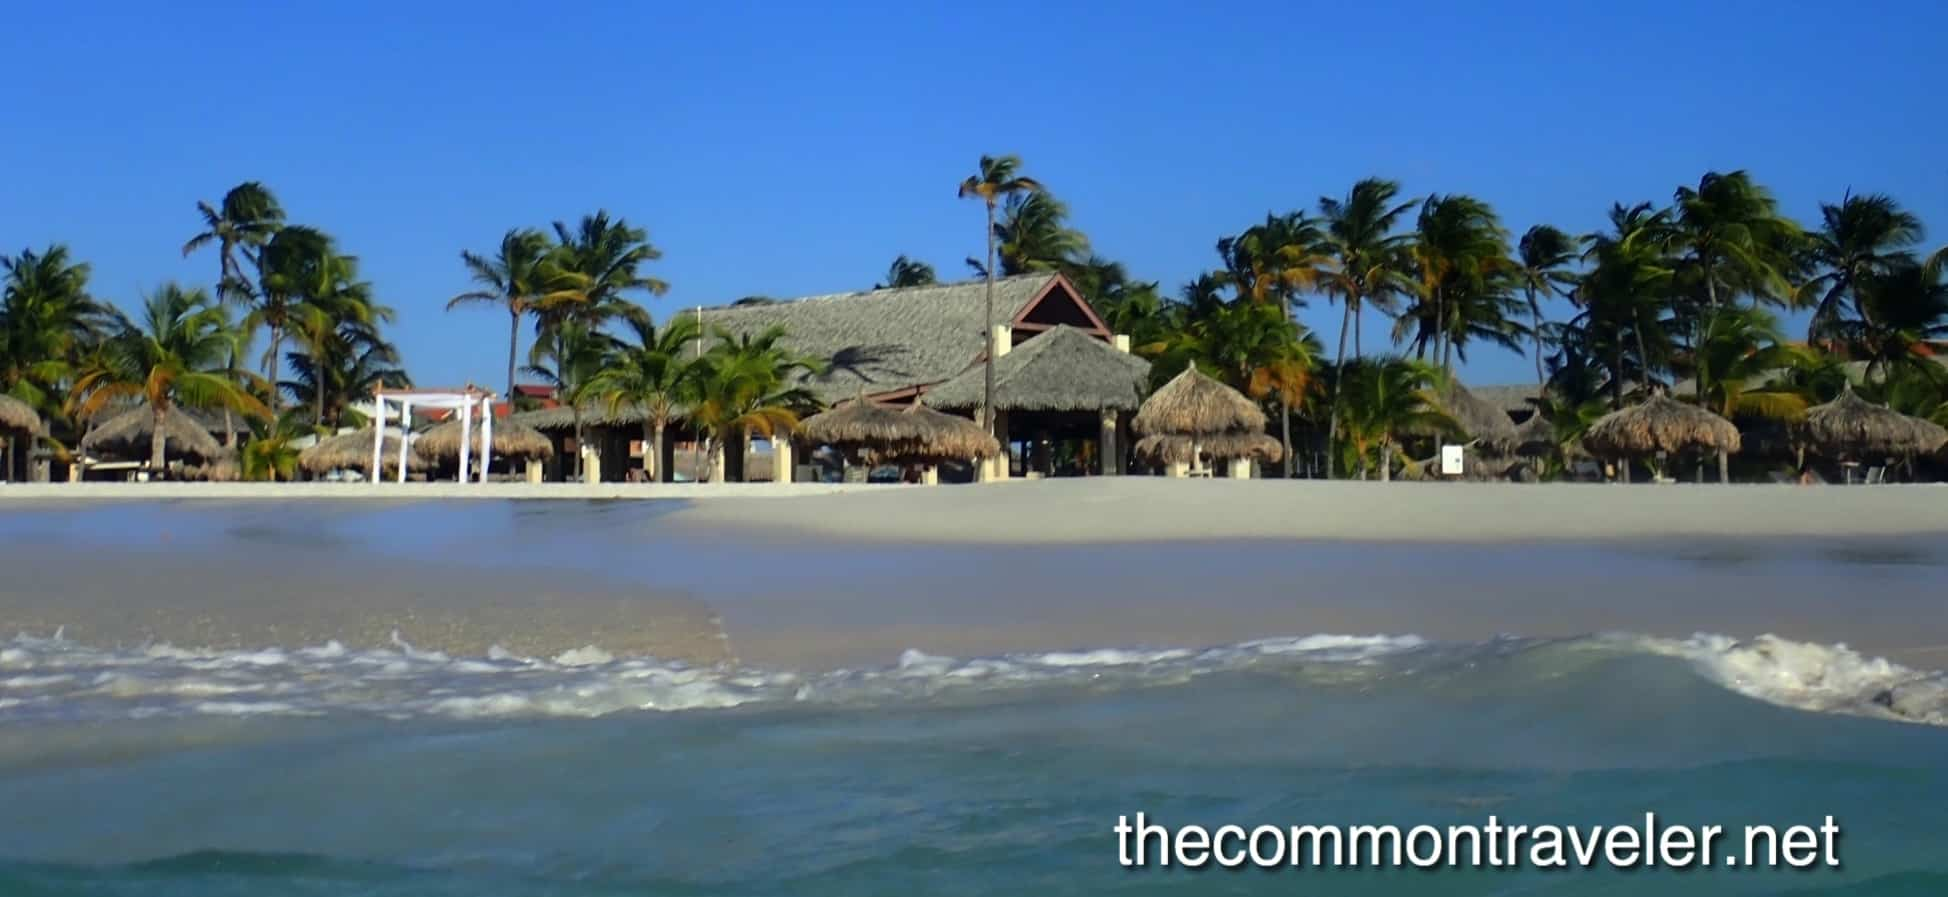 Manchebo Beach Resort & Spa, Aruba